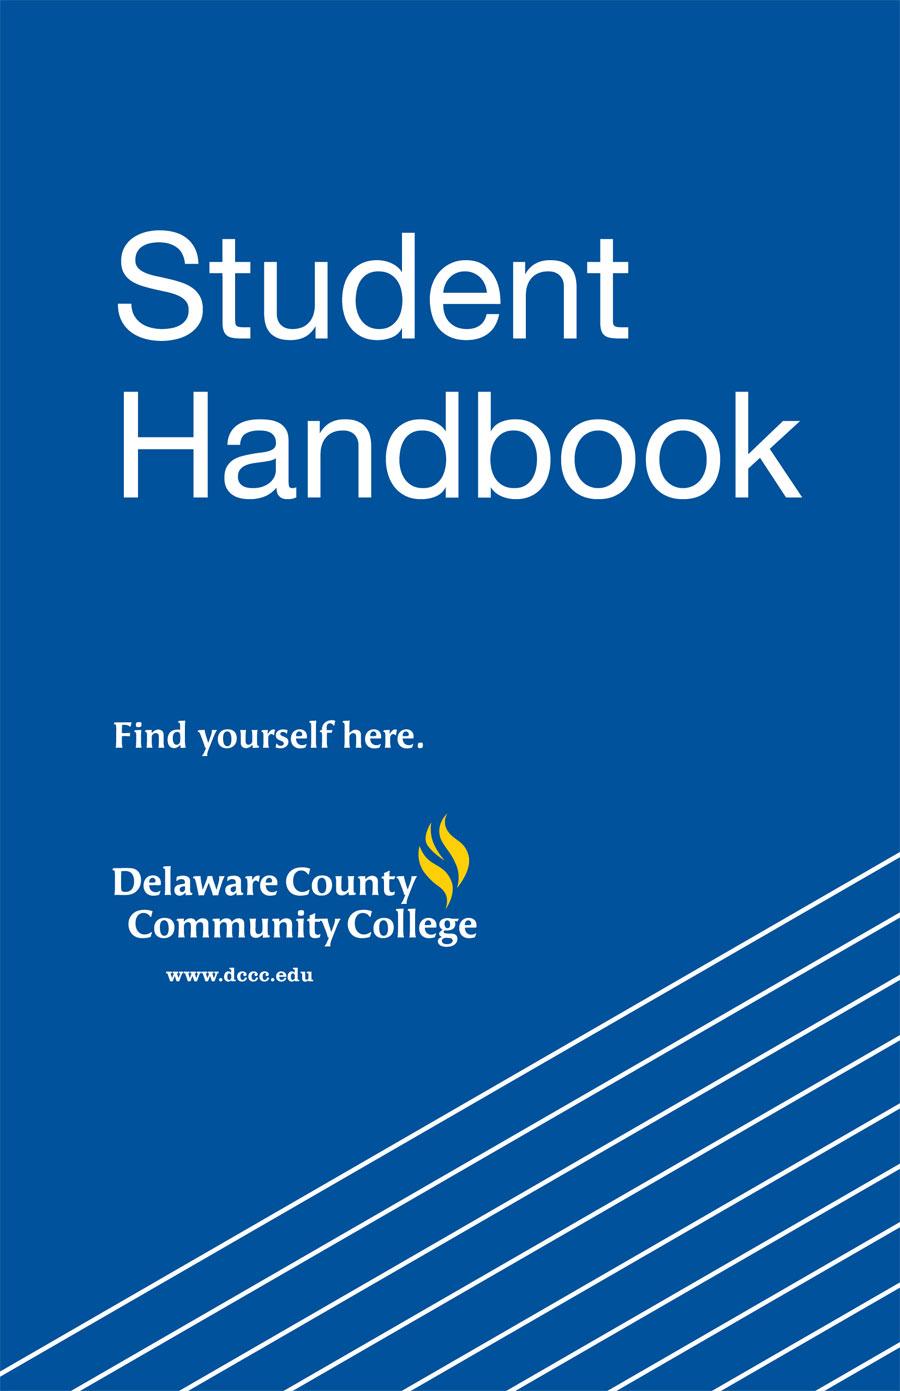 Student Handbook - Delaware County Community College Within Delaware County Community College Calendar